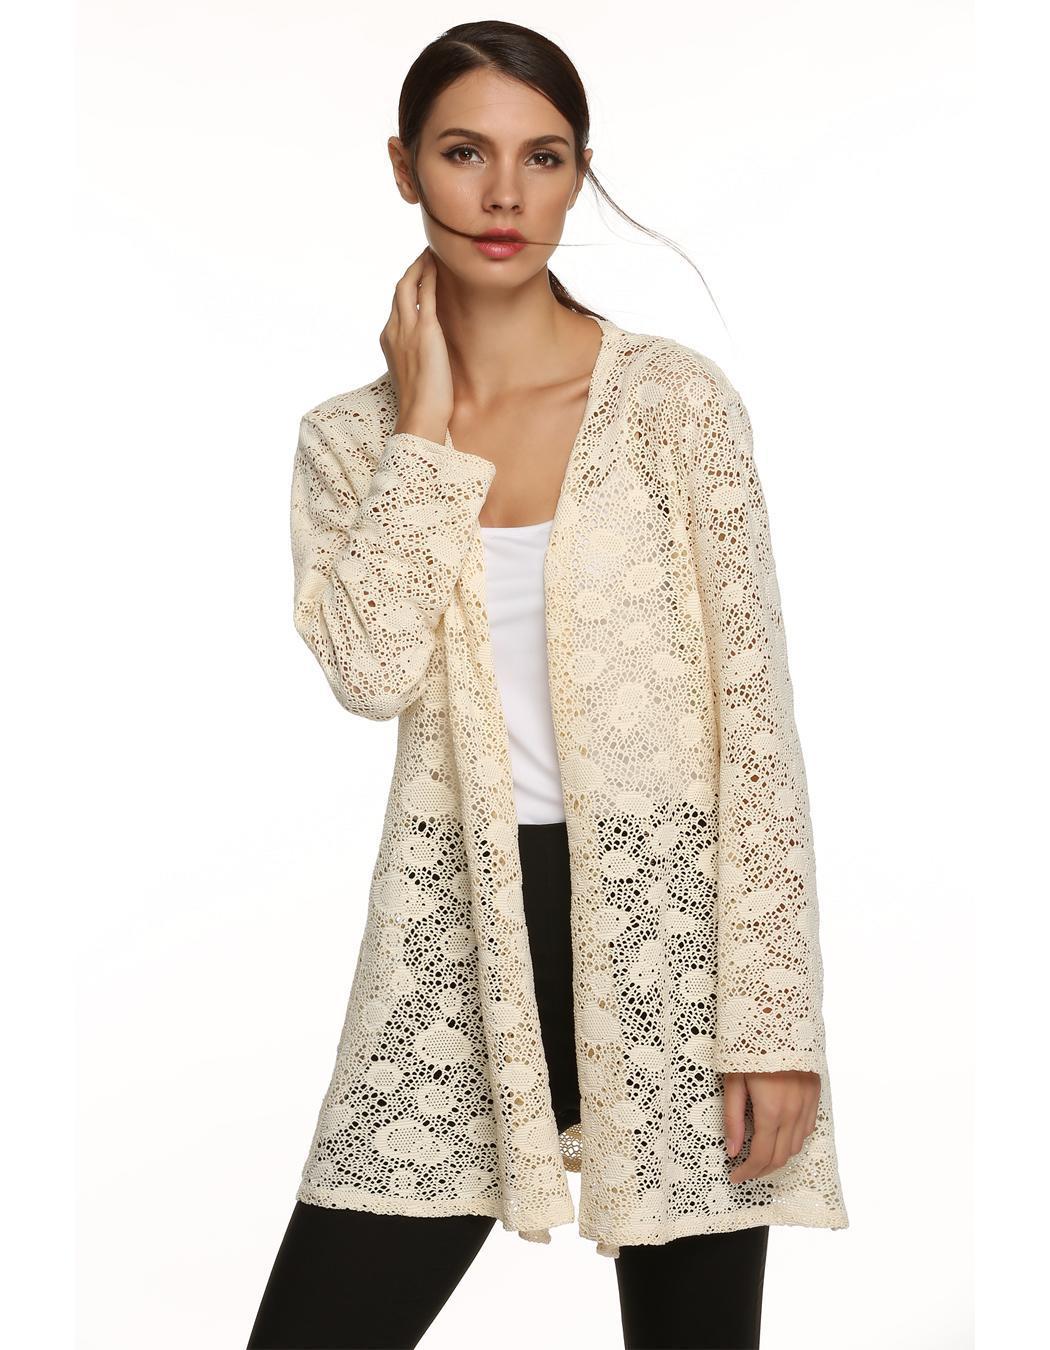 Women Long Sleeve Hollow Out Crochet Long Cardigan Tops 1